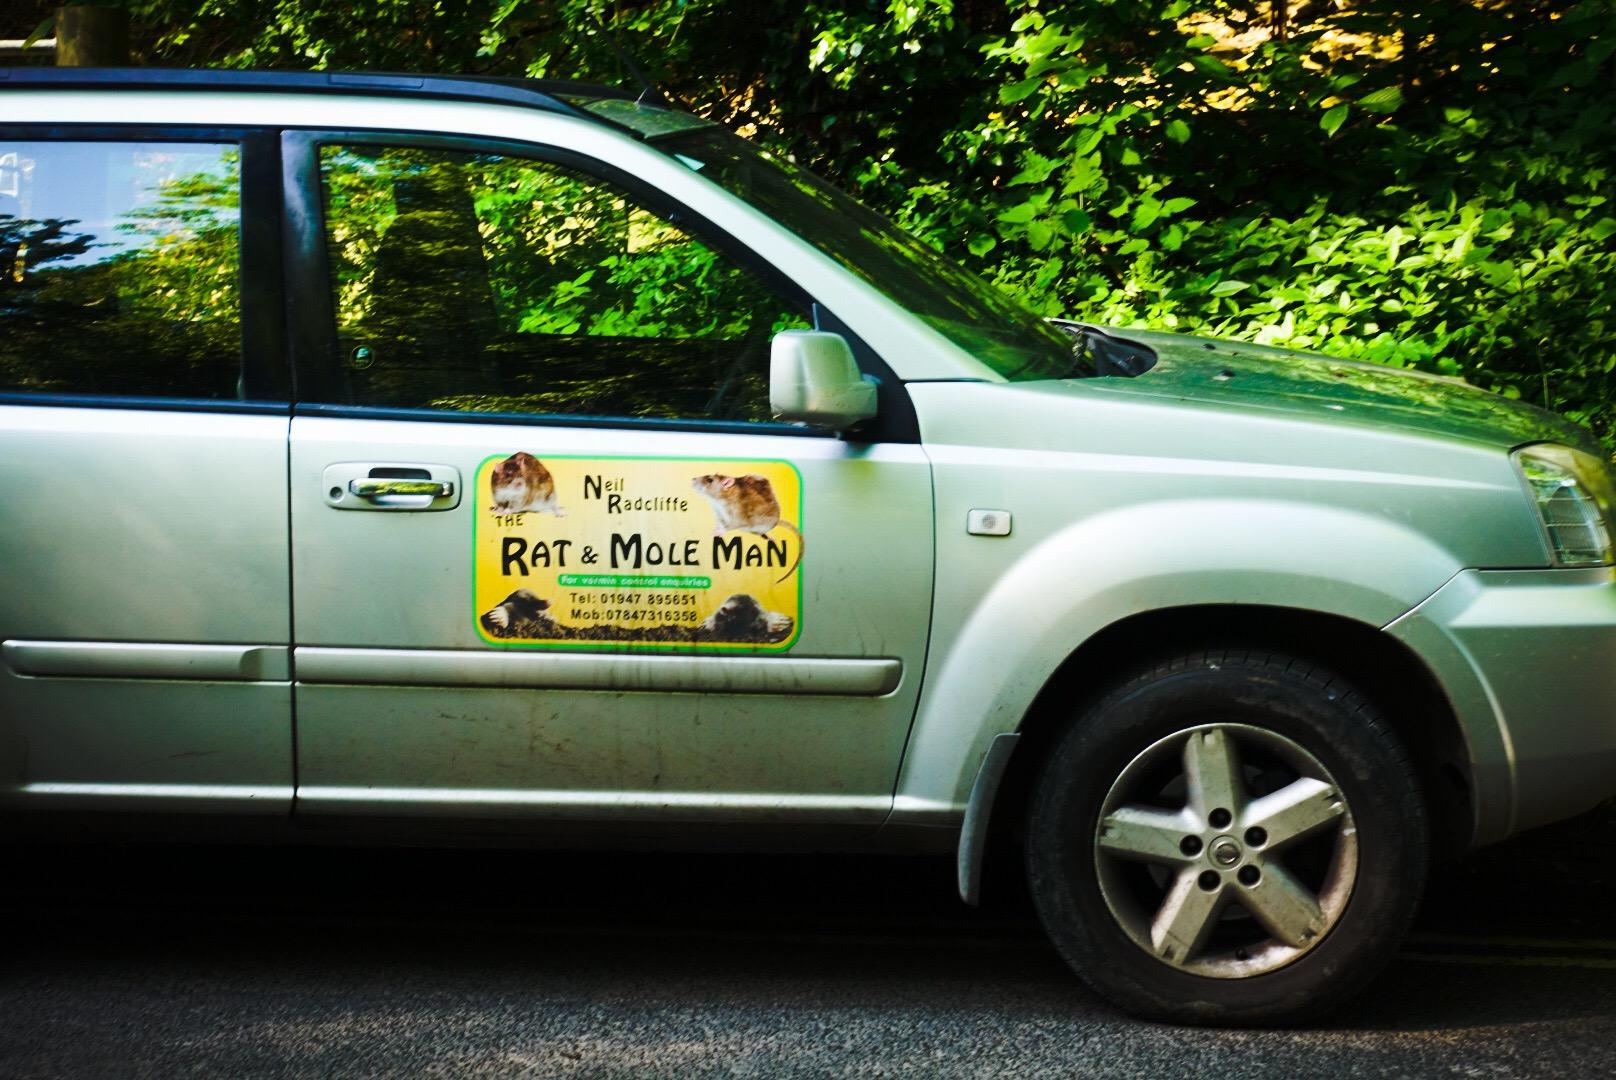 Rat & Mole Man